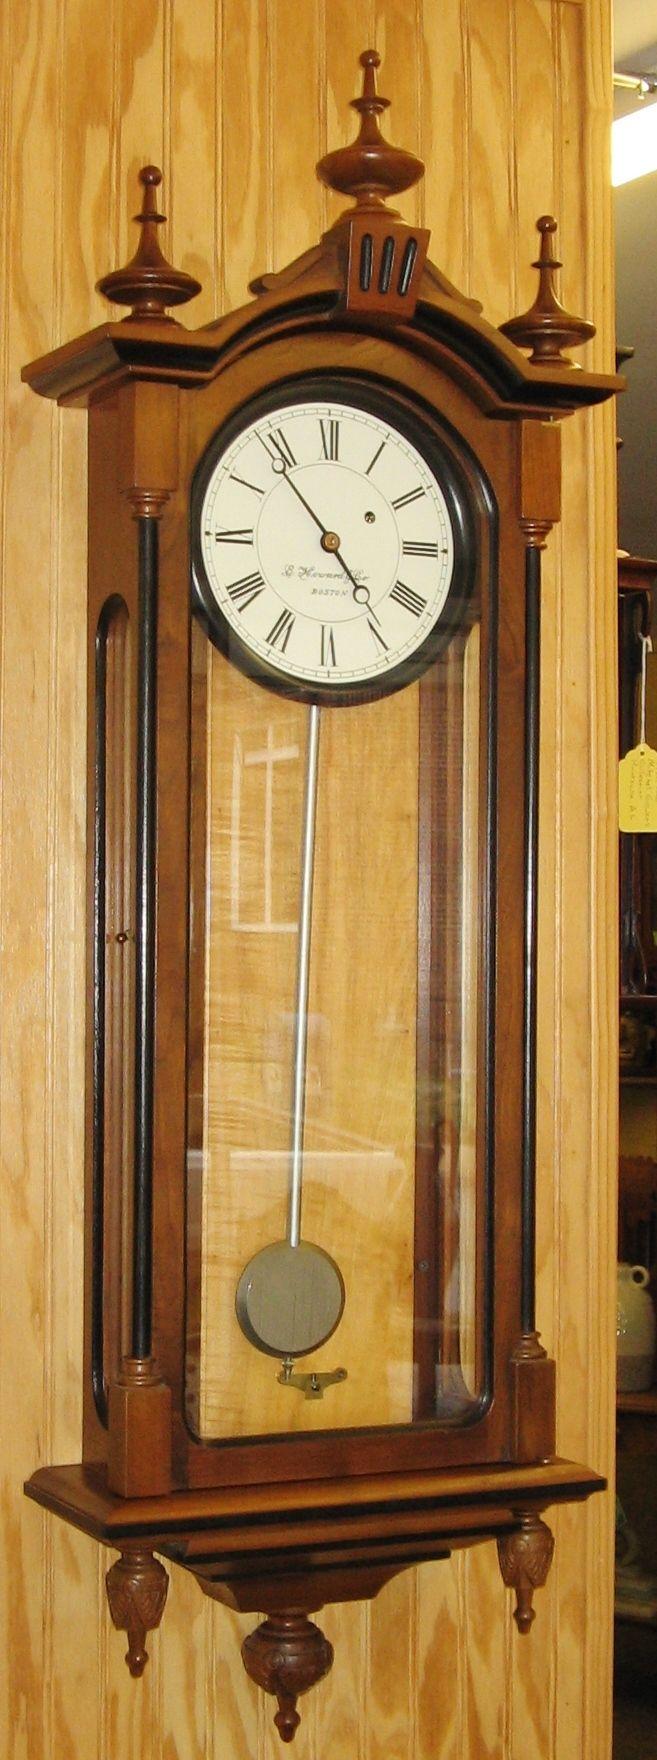 E Howard Co Boston Regulator 59 Weight Driven Wall Clock 1107 Removed Clock Wall Clock Bracket Clocks